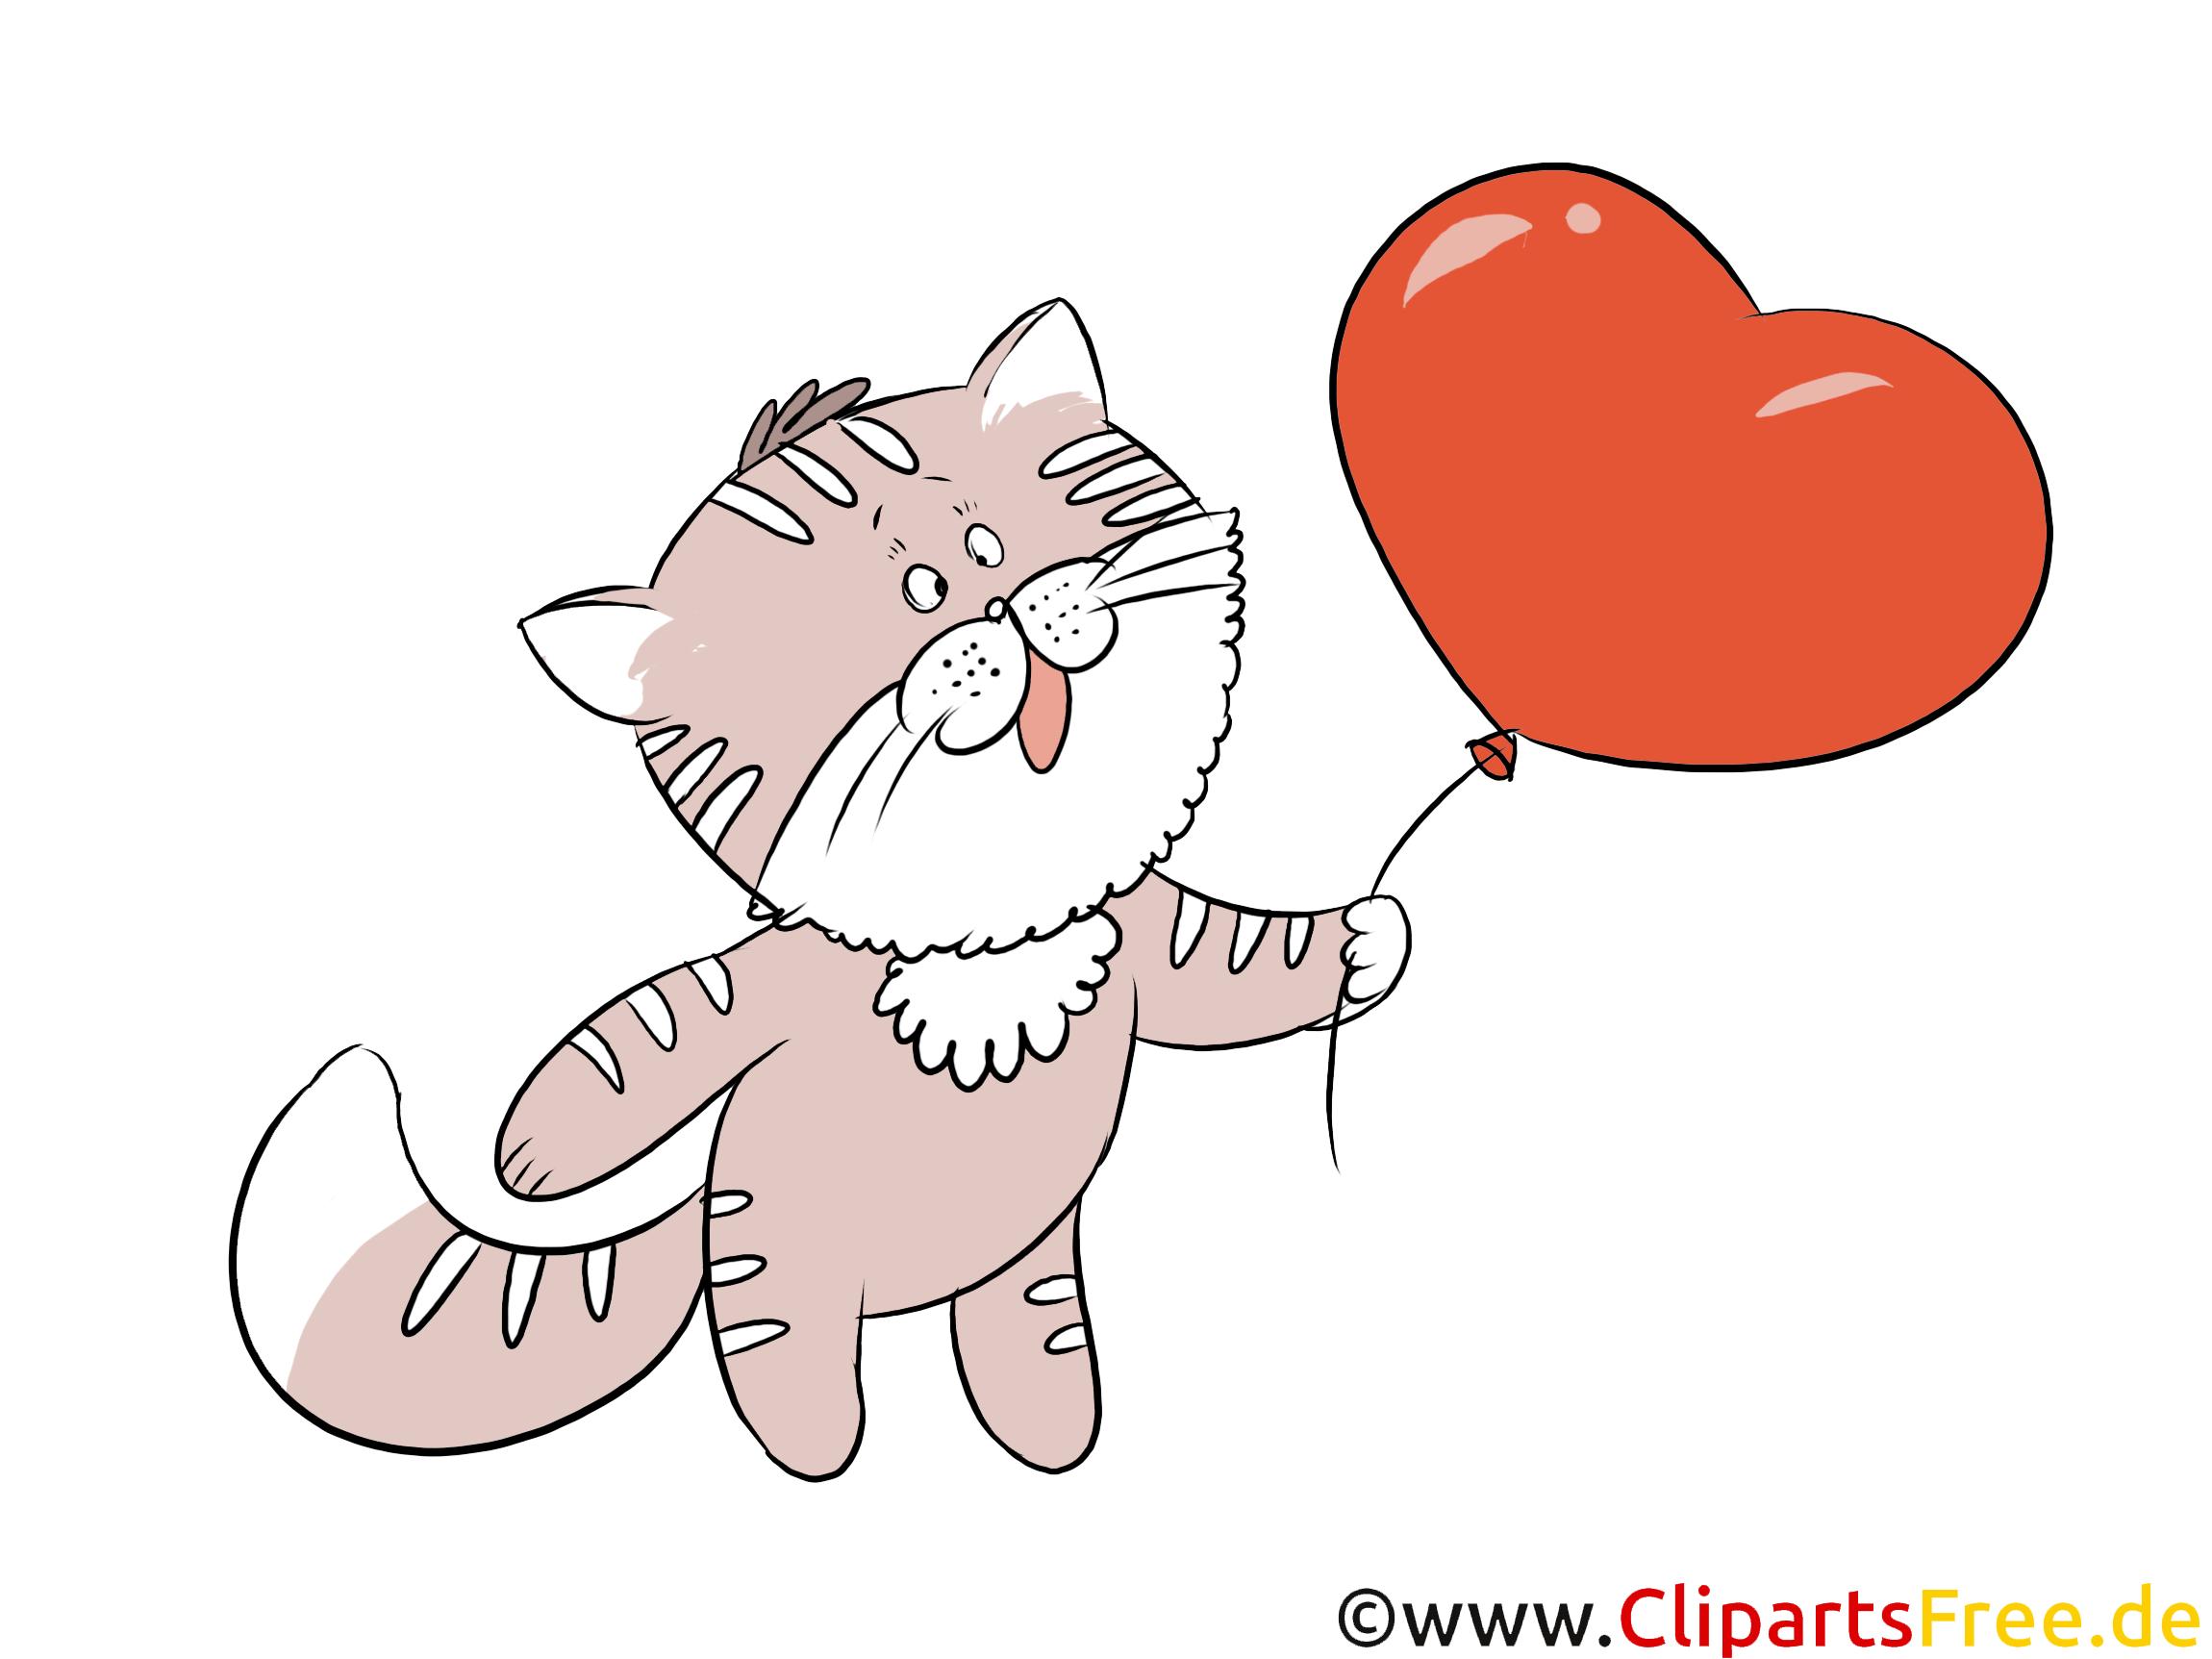 Clipart Herz, Luftballon, Katze kostenlos